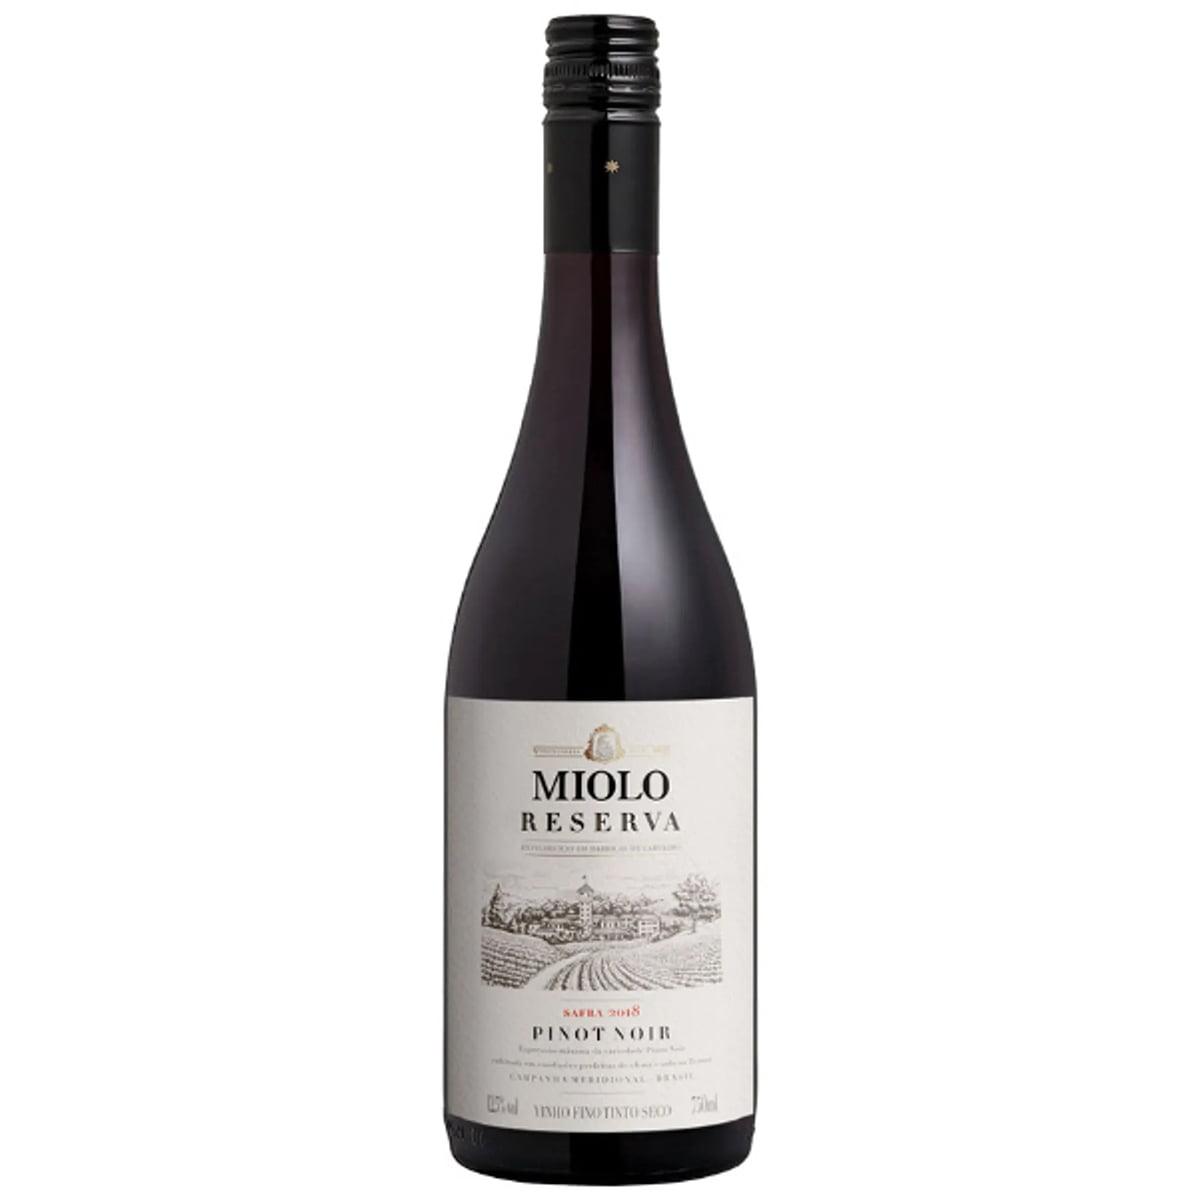 Vinho Miolo Reserva Pinot Noir Tinto Seco 750ml